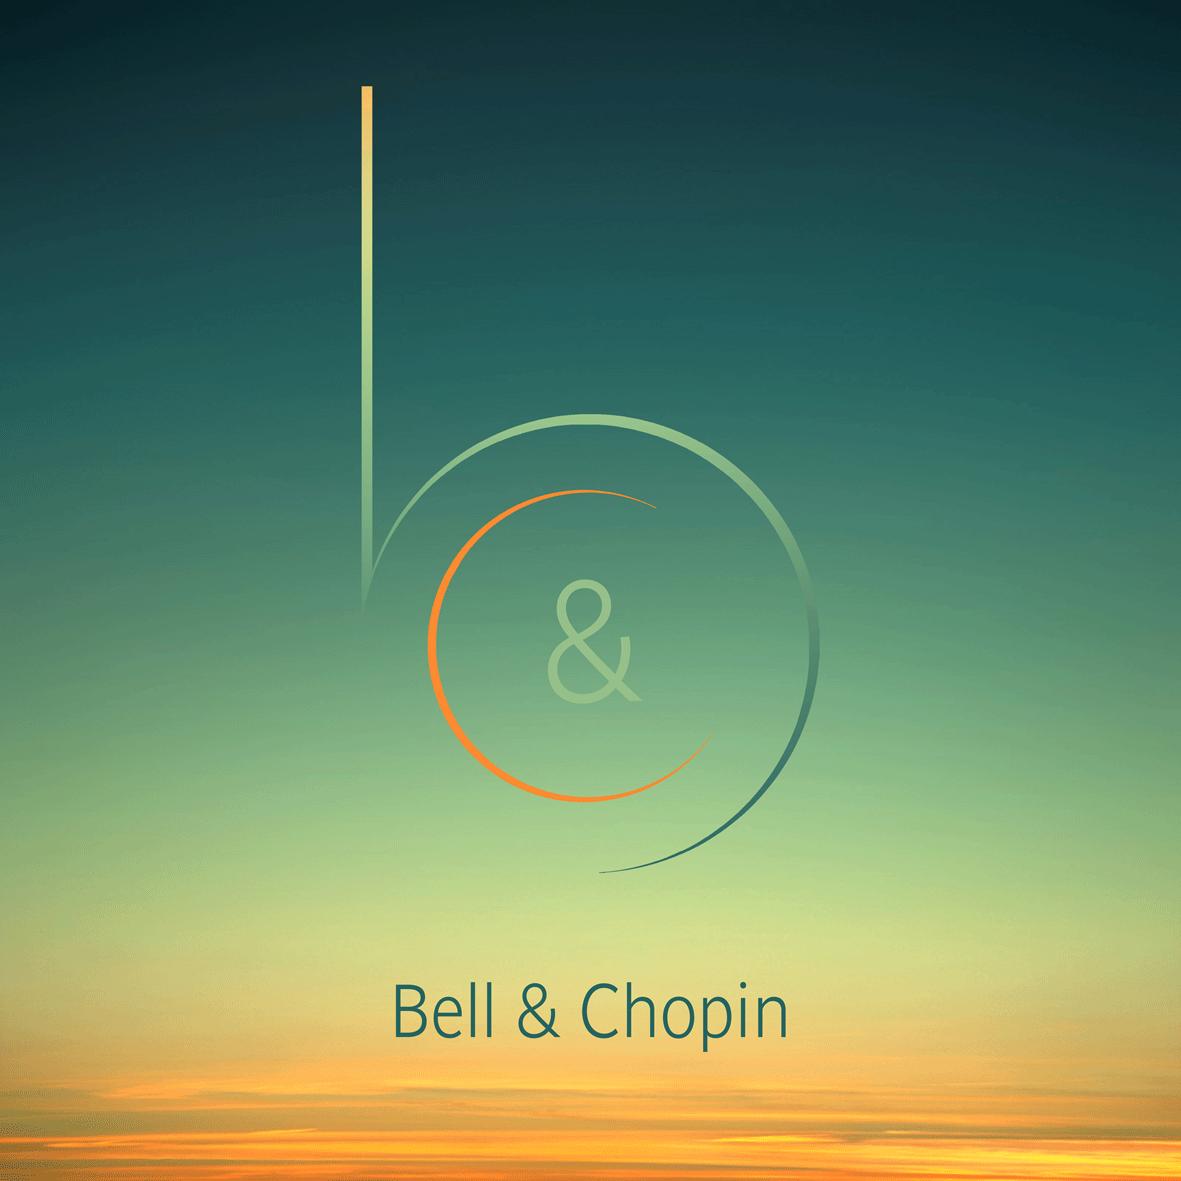 Design_Logo-Bell-Chopin